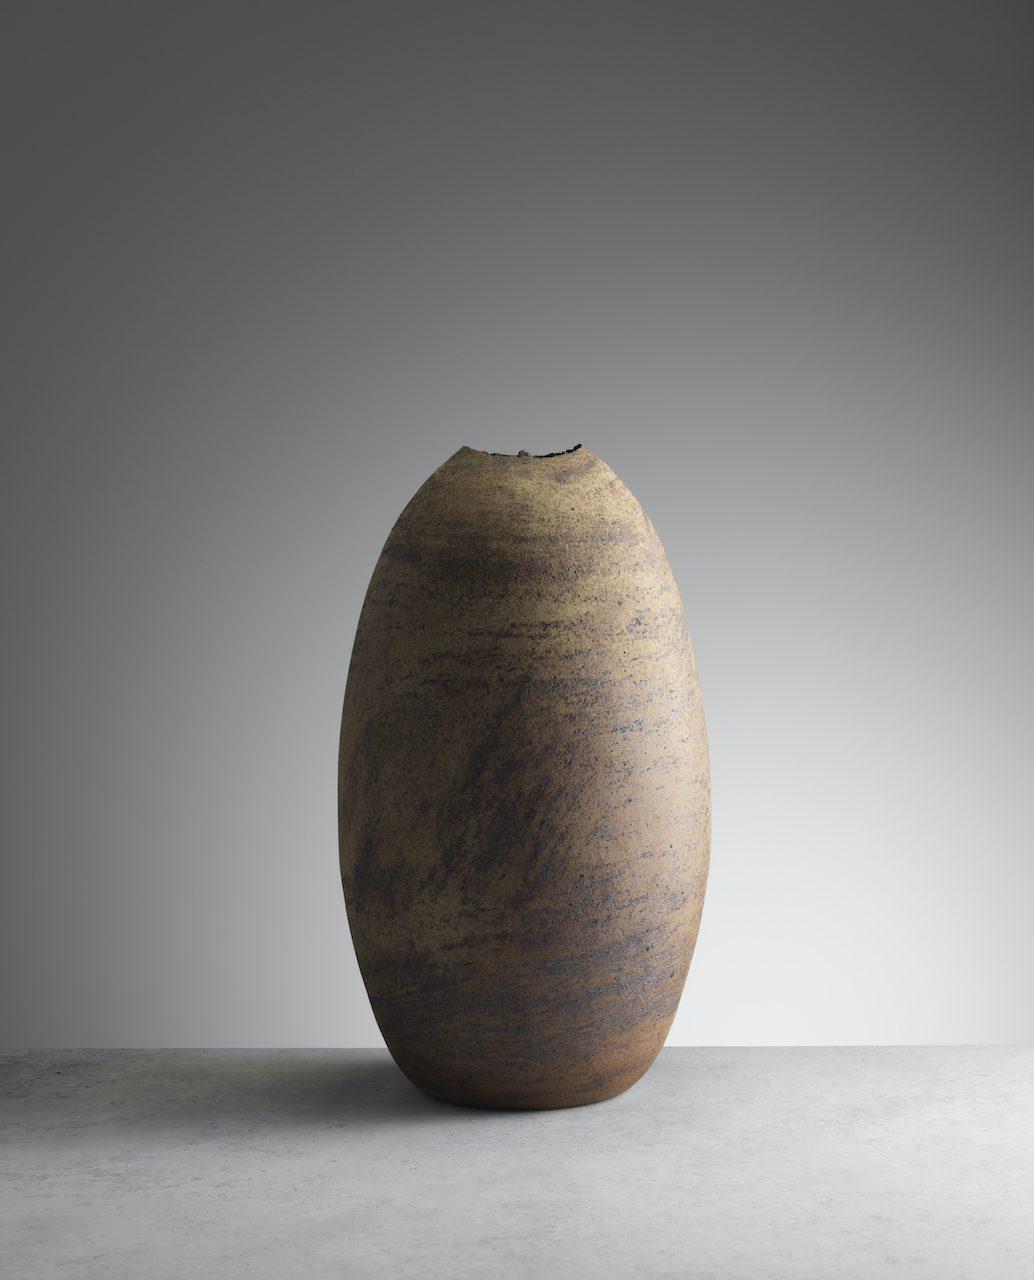 Joanna Constantinidis, Large Ovoid Vessel, c1985. Ceramics, 40cm tall. Courtesy of Oxford Ceramics.